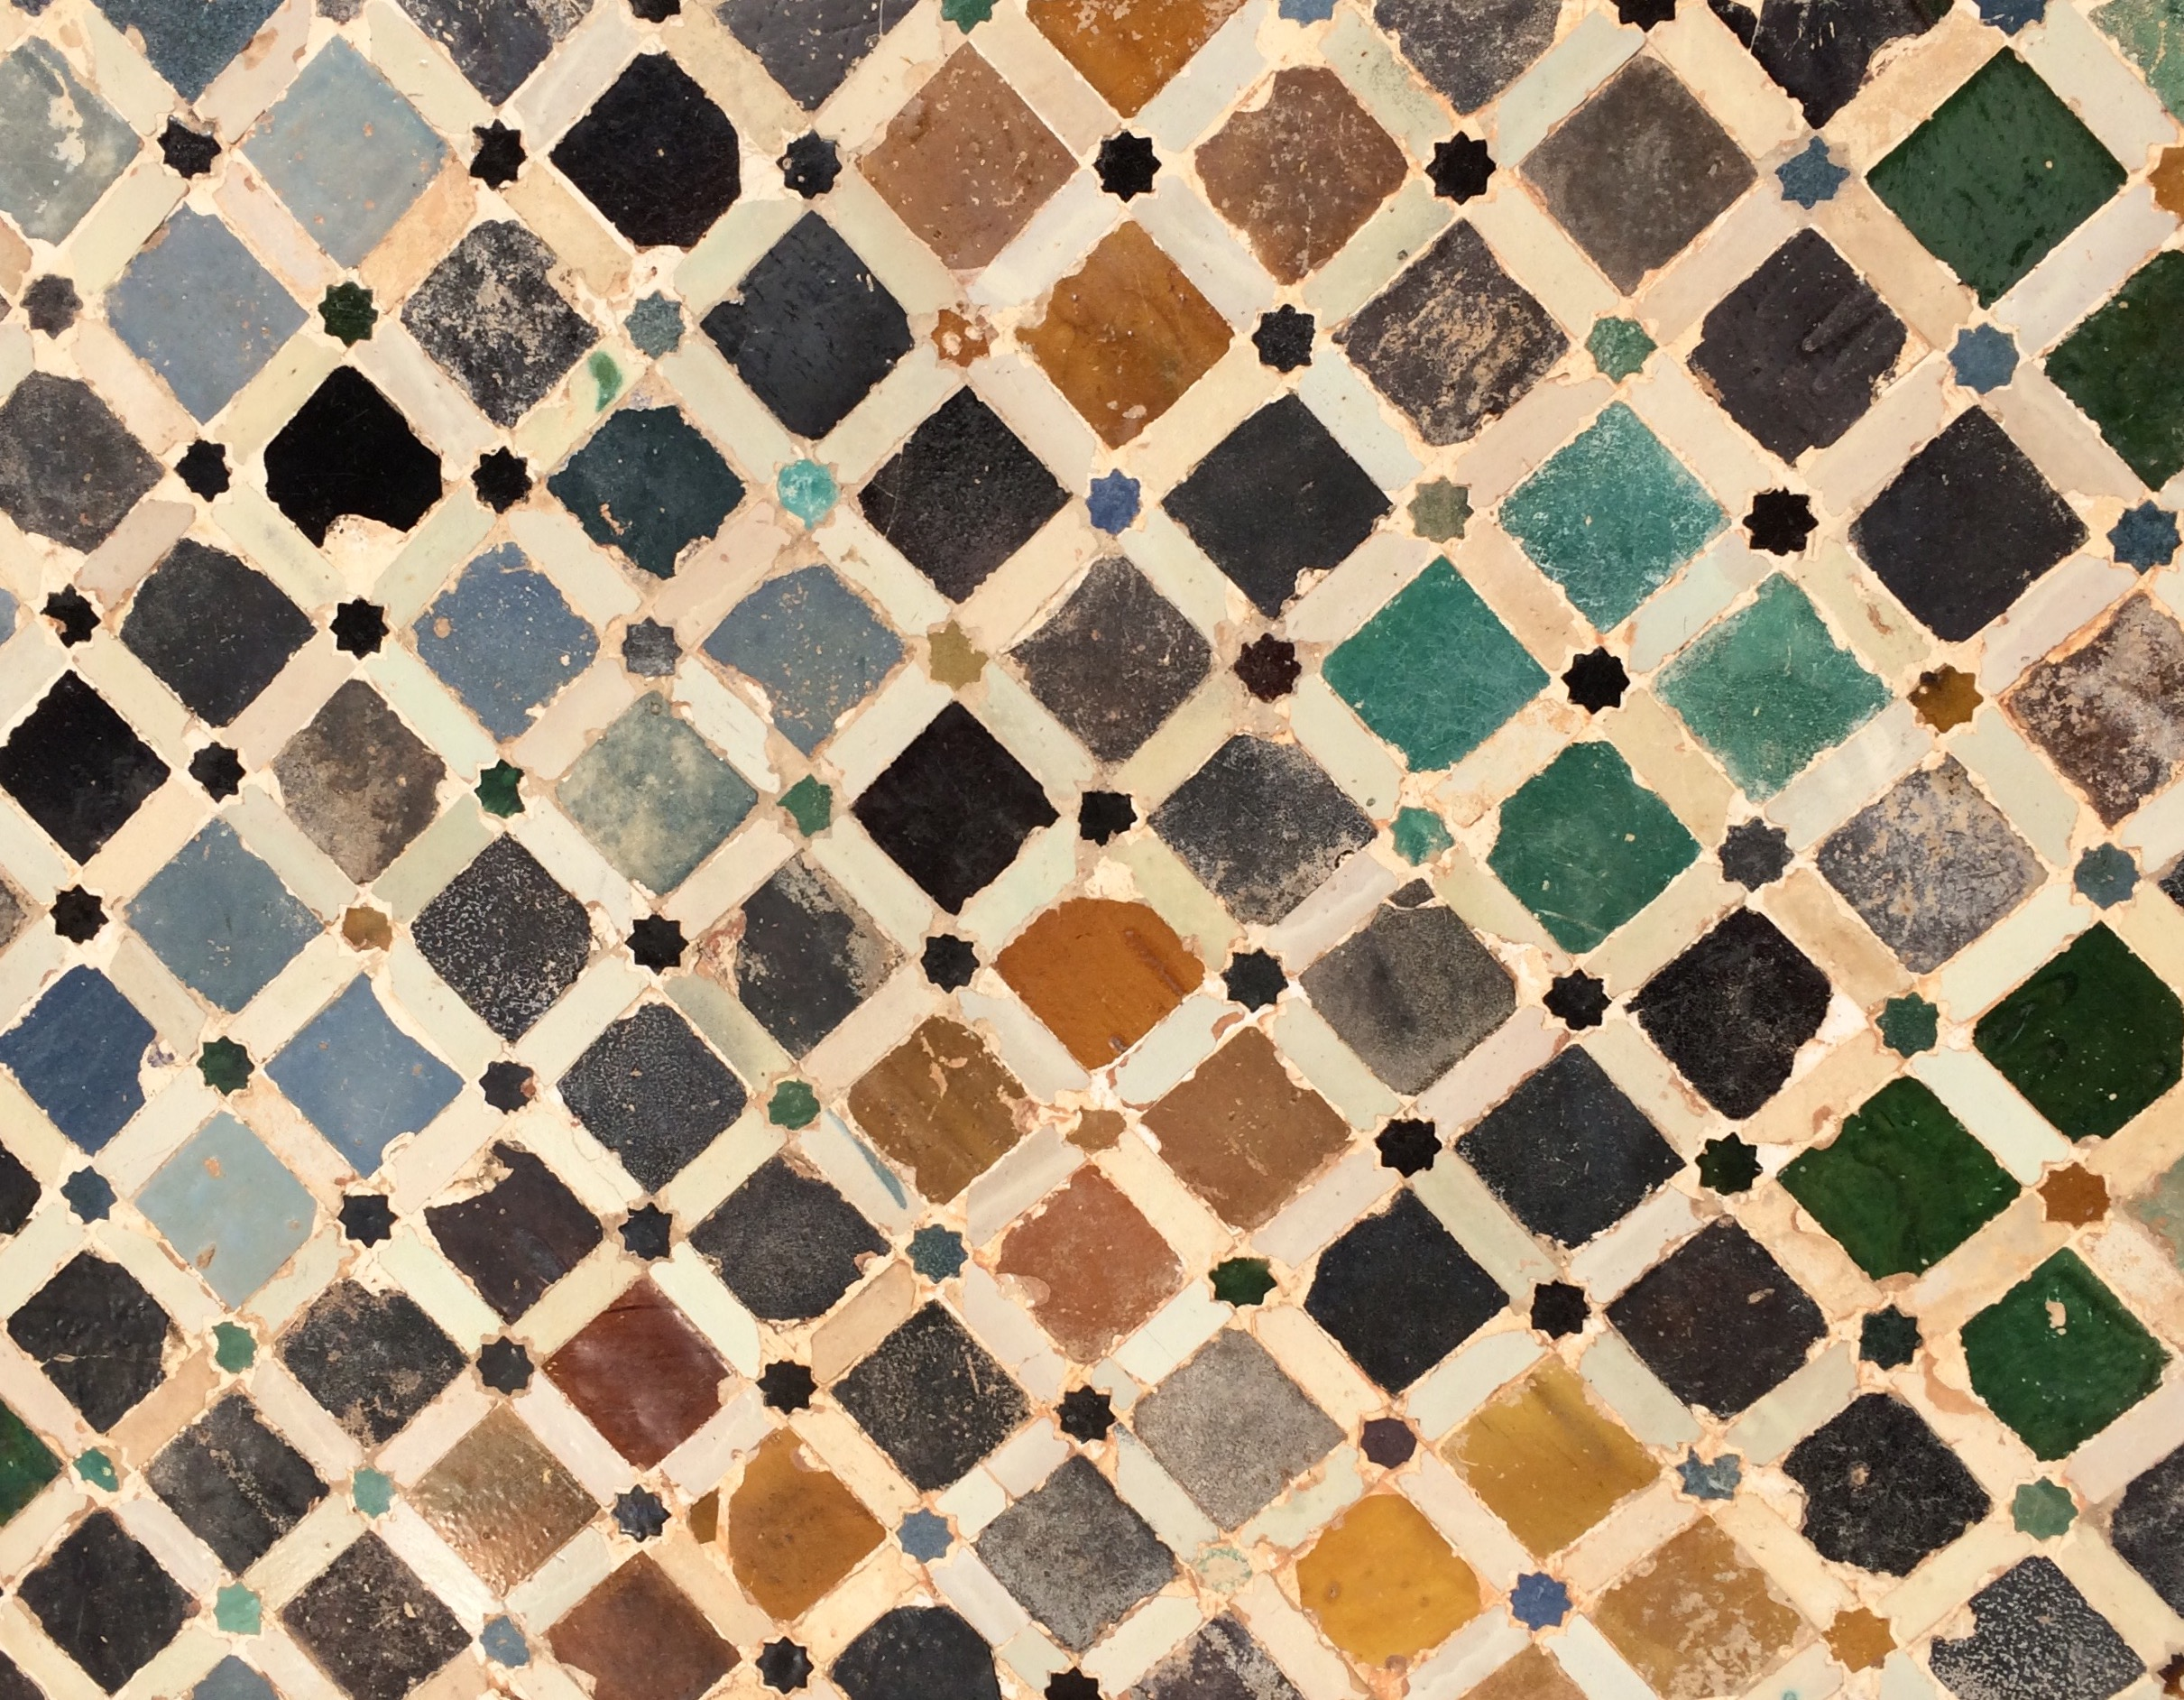 Alhambra Granada Spain - ceramic tiles